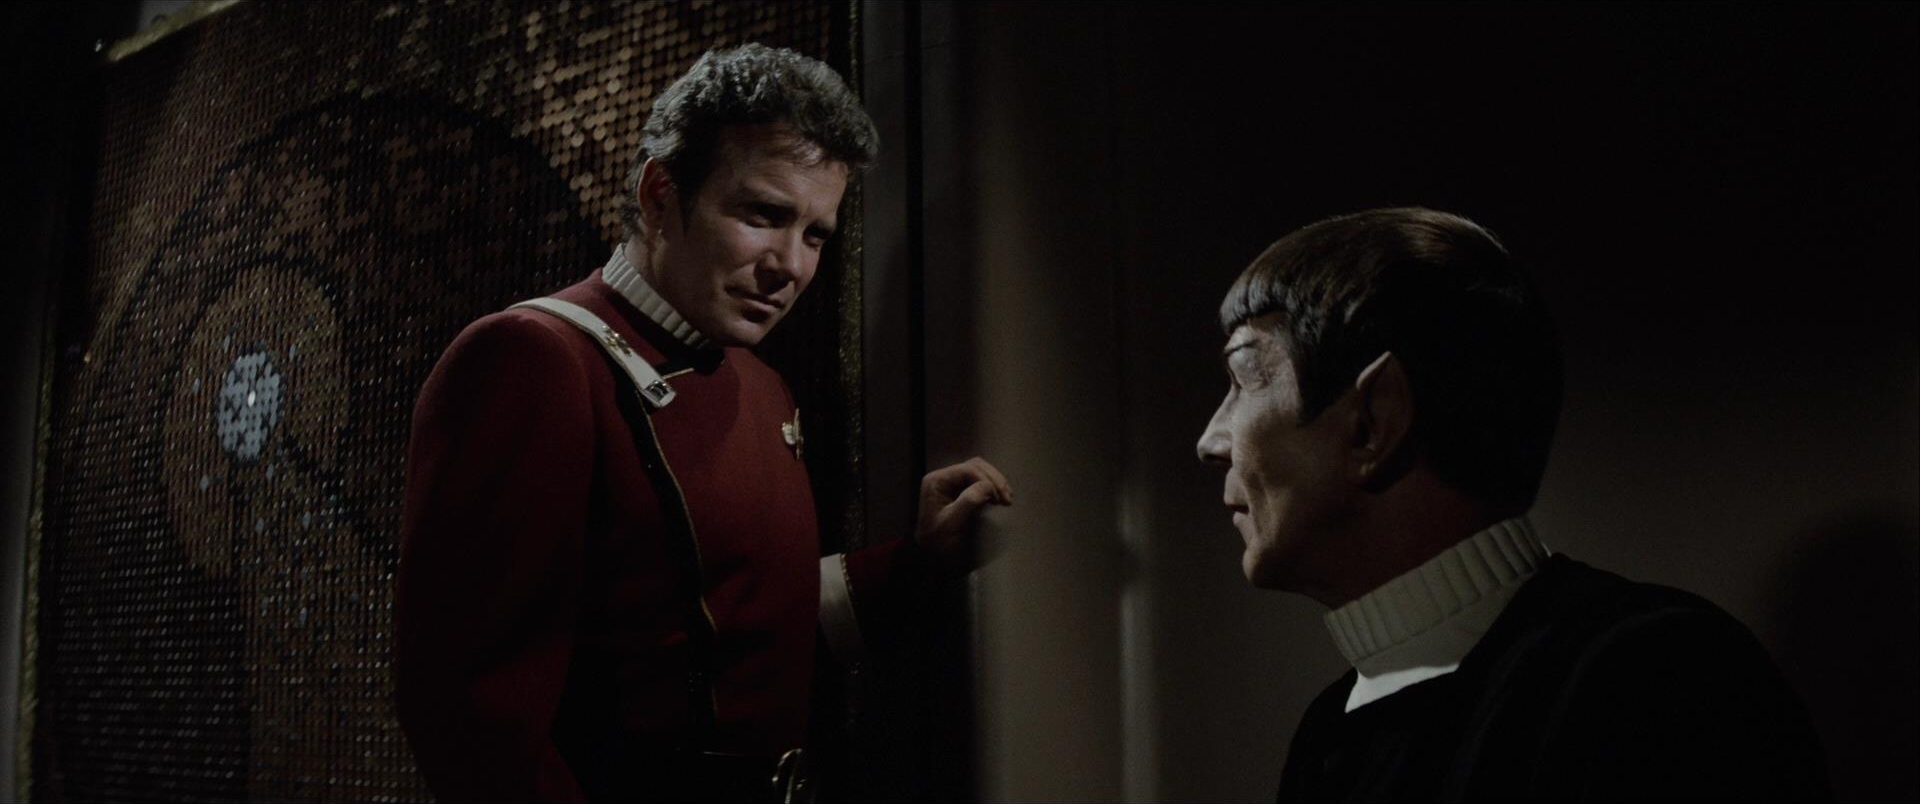 Star Trek Ii The Wrath Of Khan Director S Cut Blu Ray